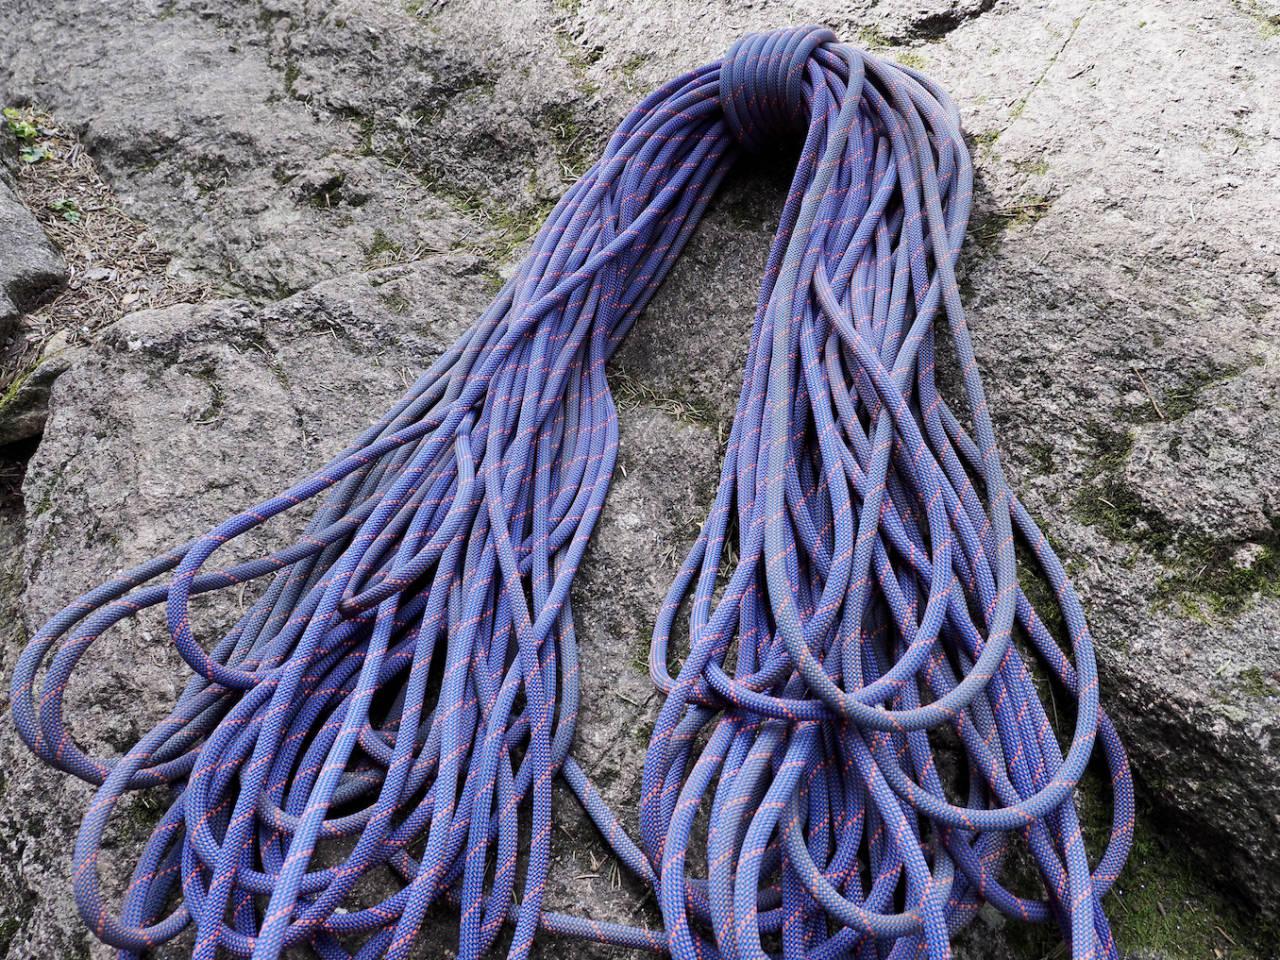 MAMMUT CRAG SENDER DRY: Et lett og smidig tau for de erfarne klatrerne. Foto: Lisa Kvålshaugen Bjærum